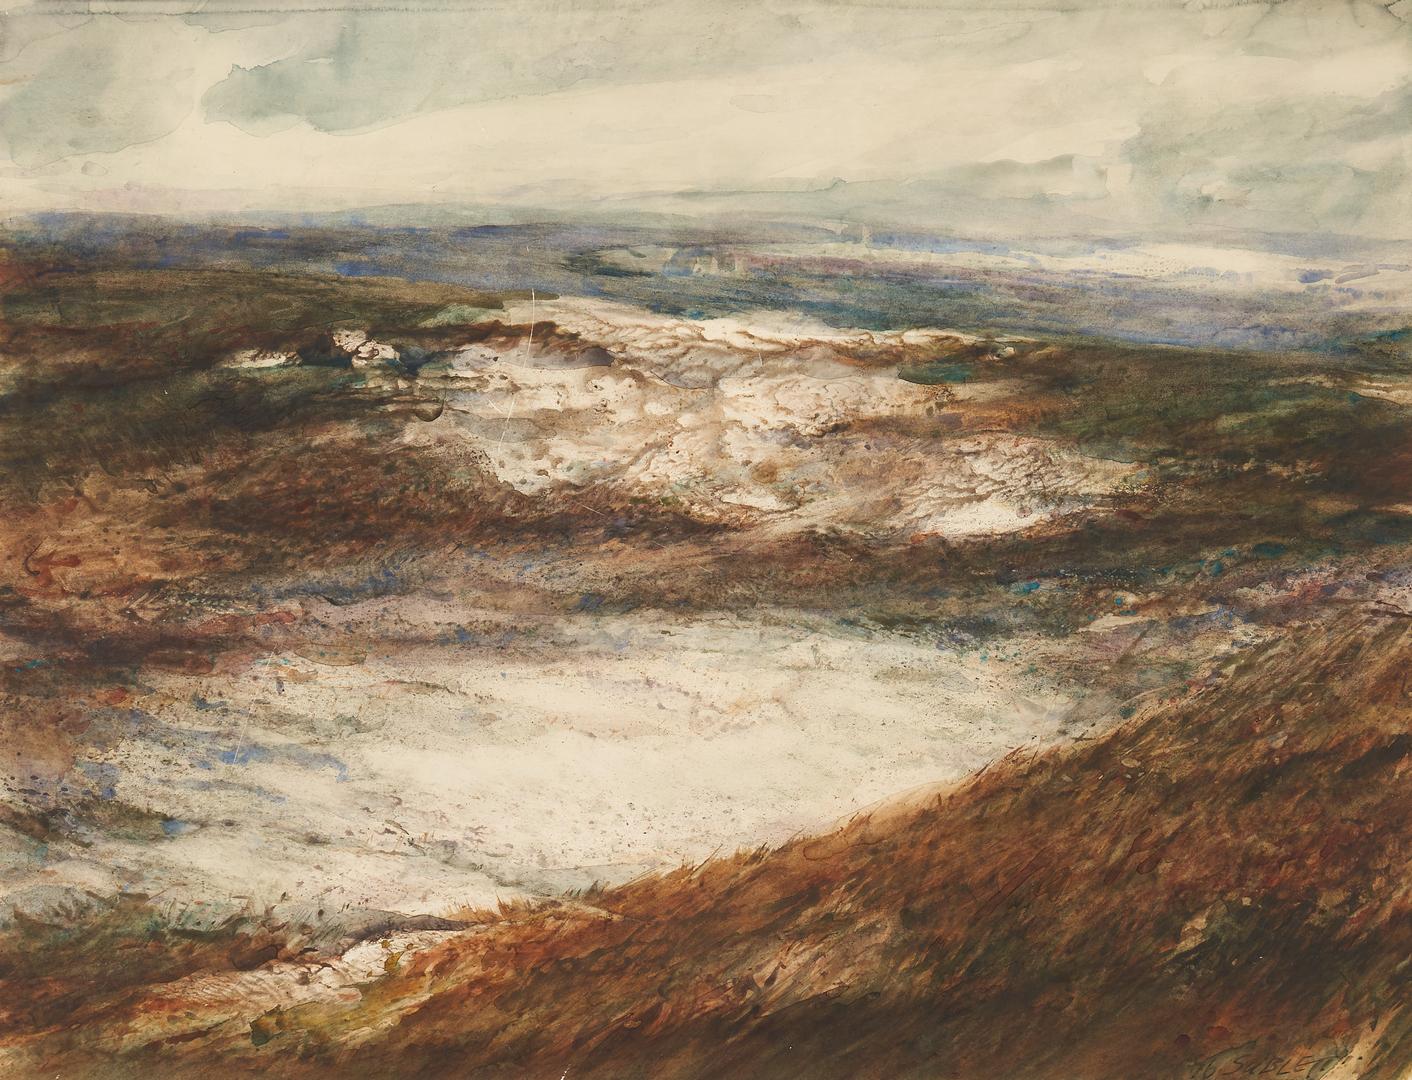 Lot 188: Exhibited Carl Sublett W/C Landscape Painting, Wintered Ridge #176